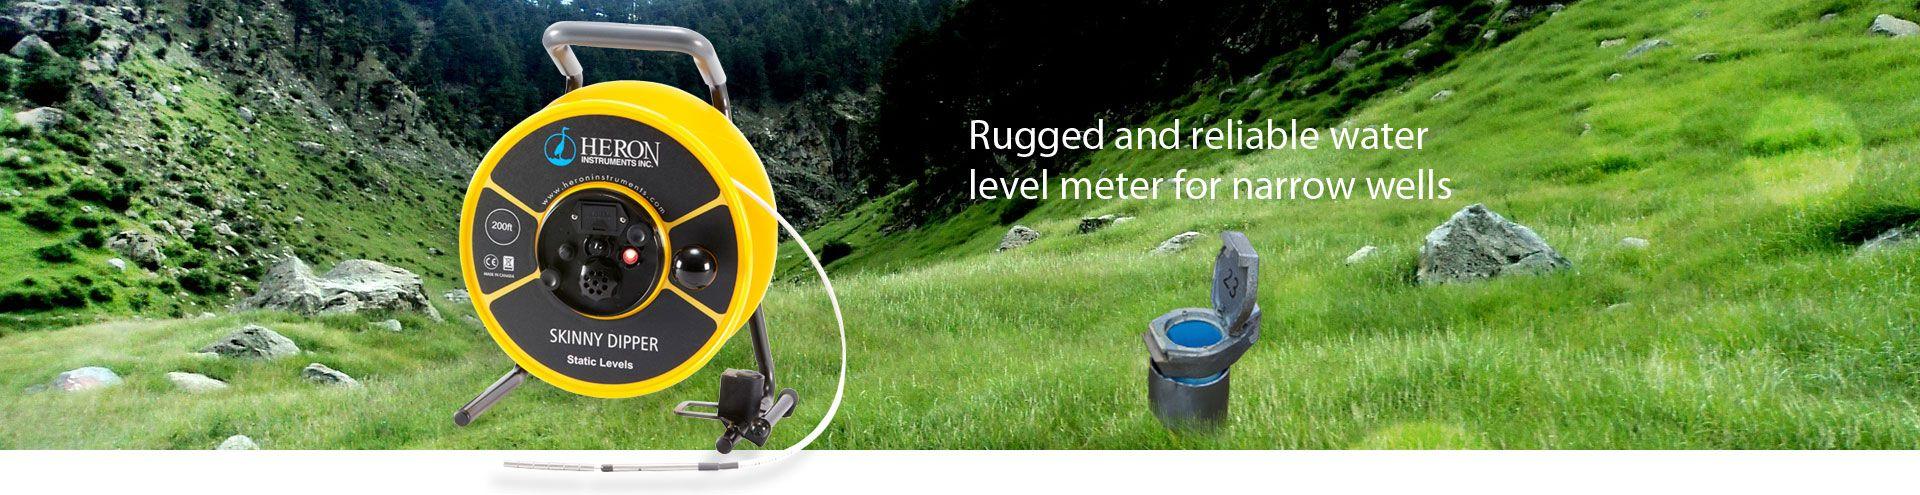 Heron SKINNY DIPPER Water Level Meters